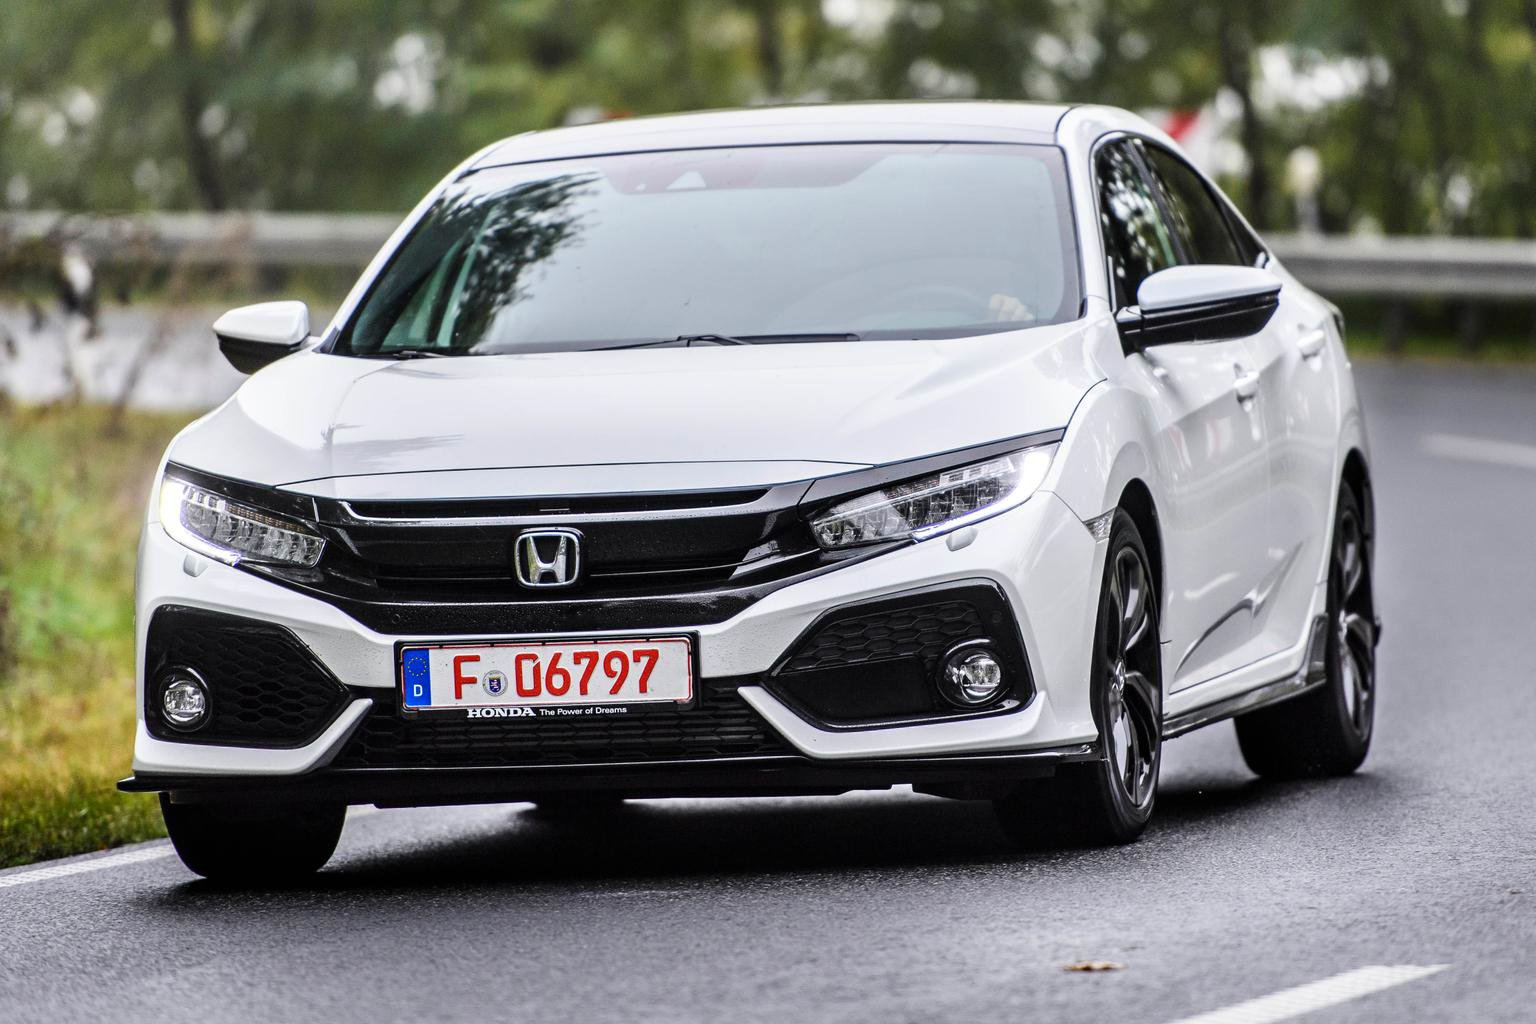 2017 Honda Civic prototype review